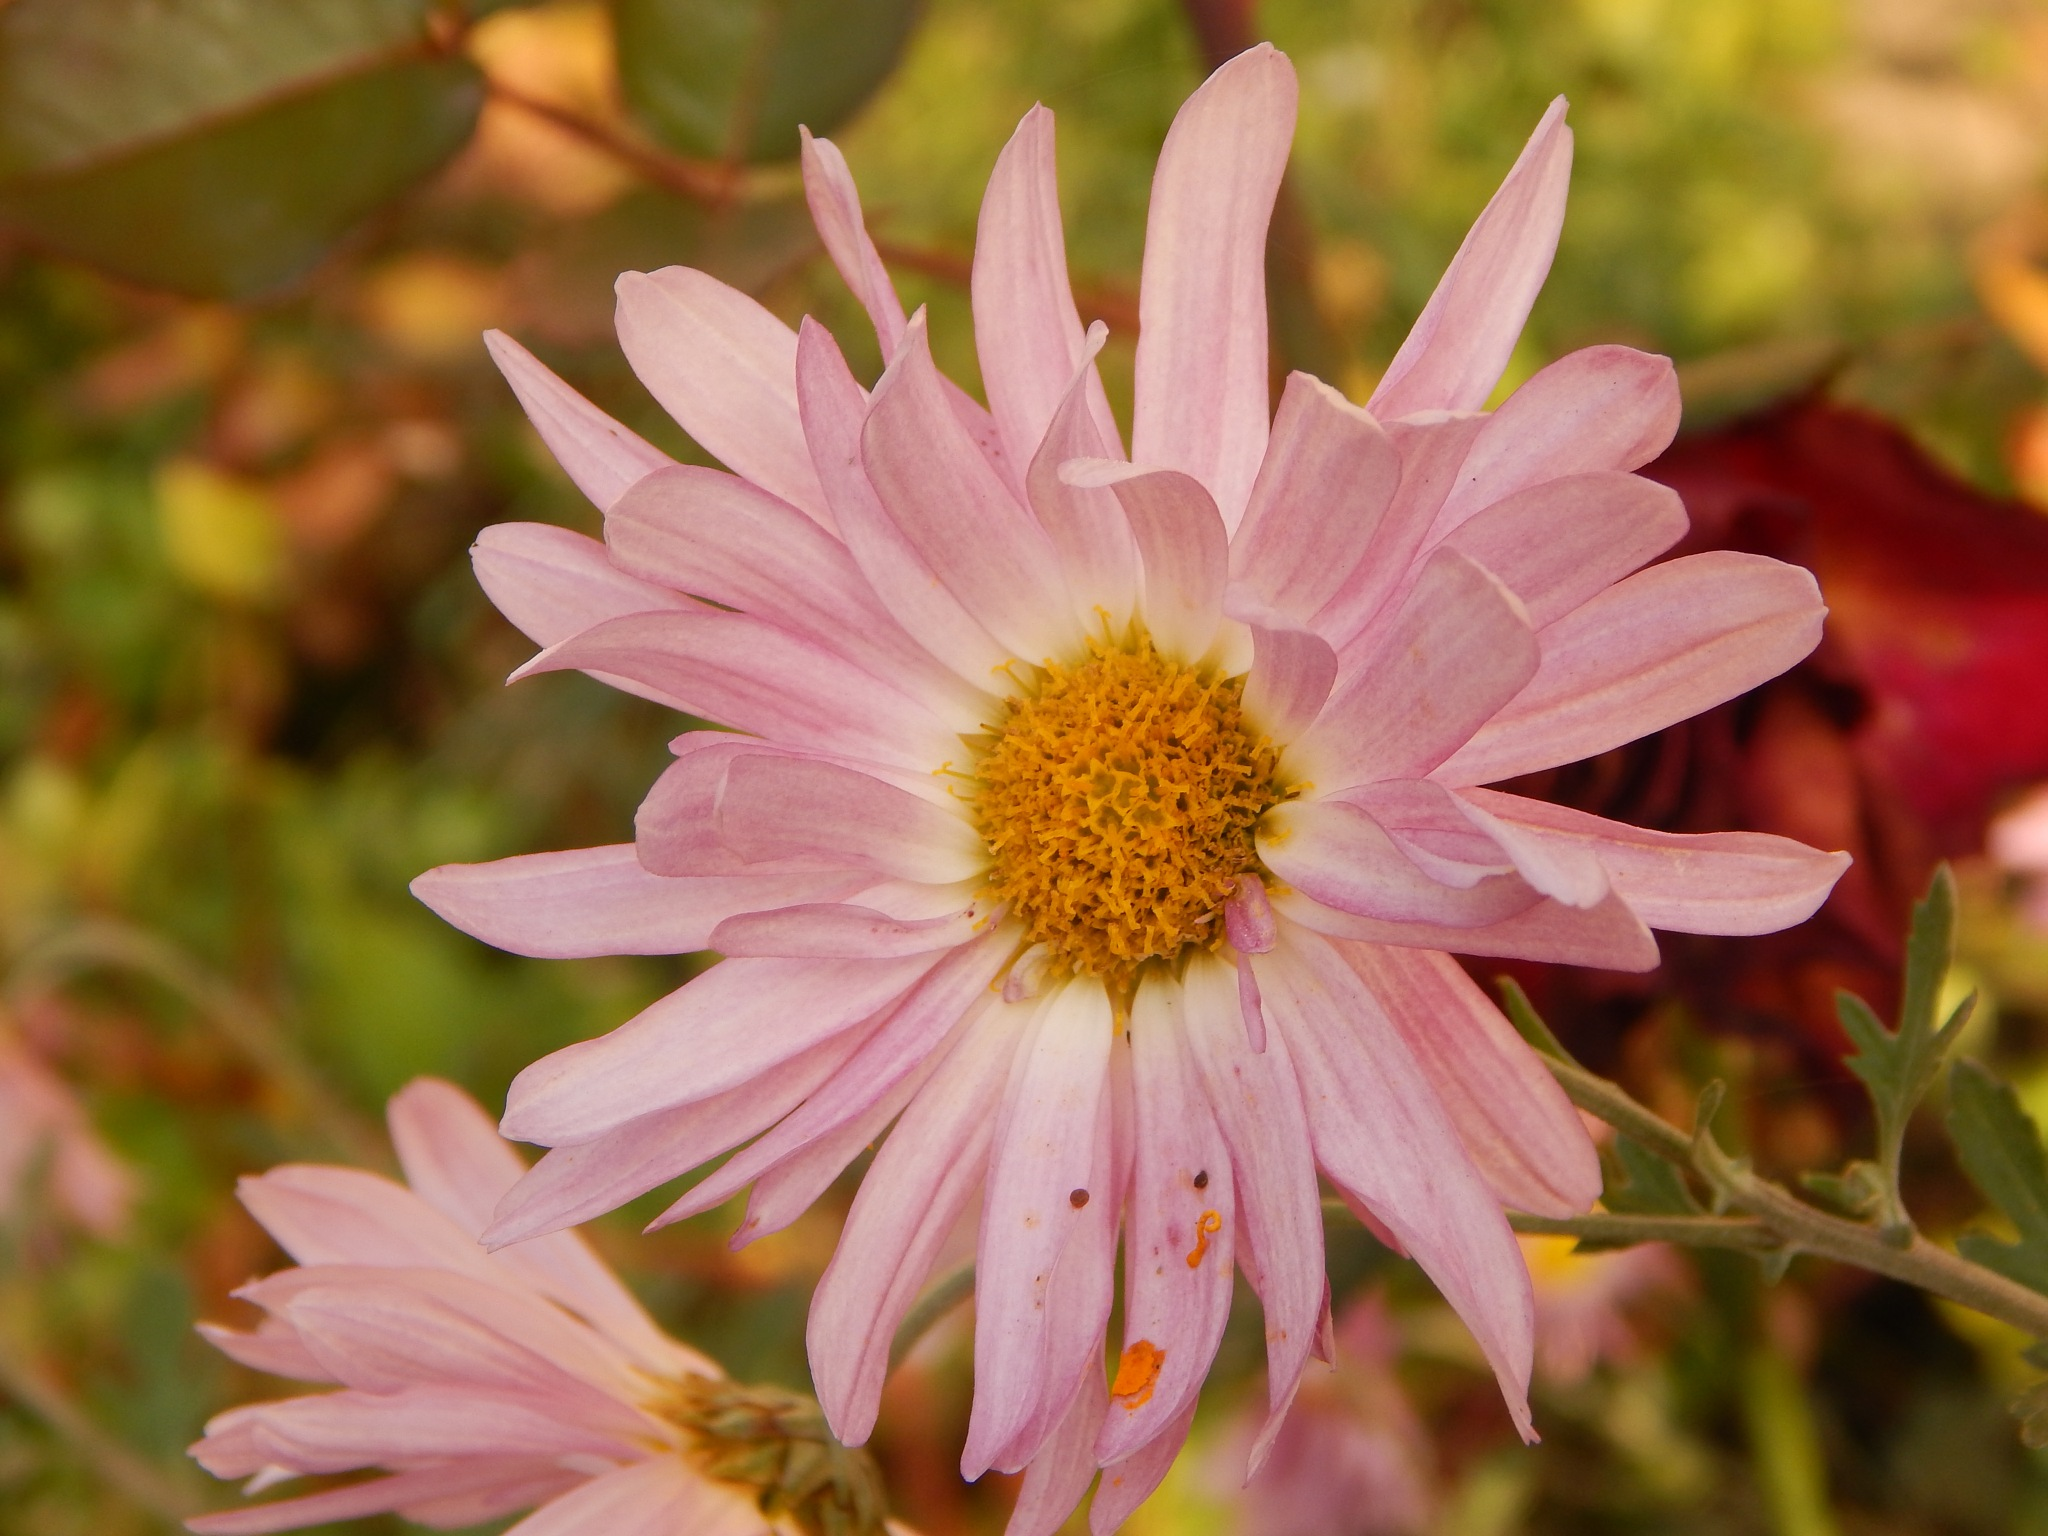 Chrysanthemum by Goran Vuletic